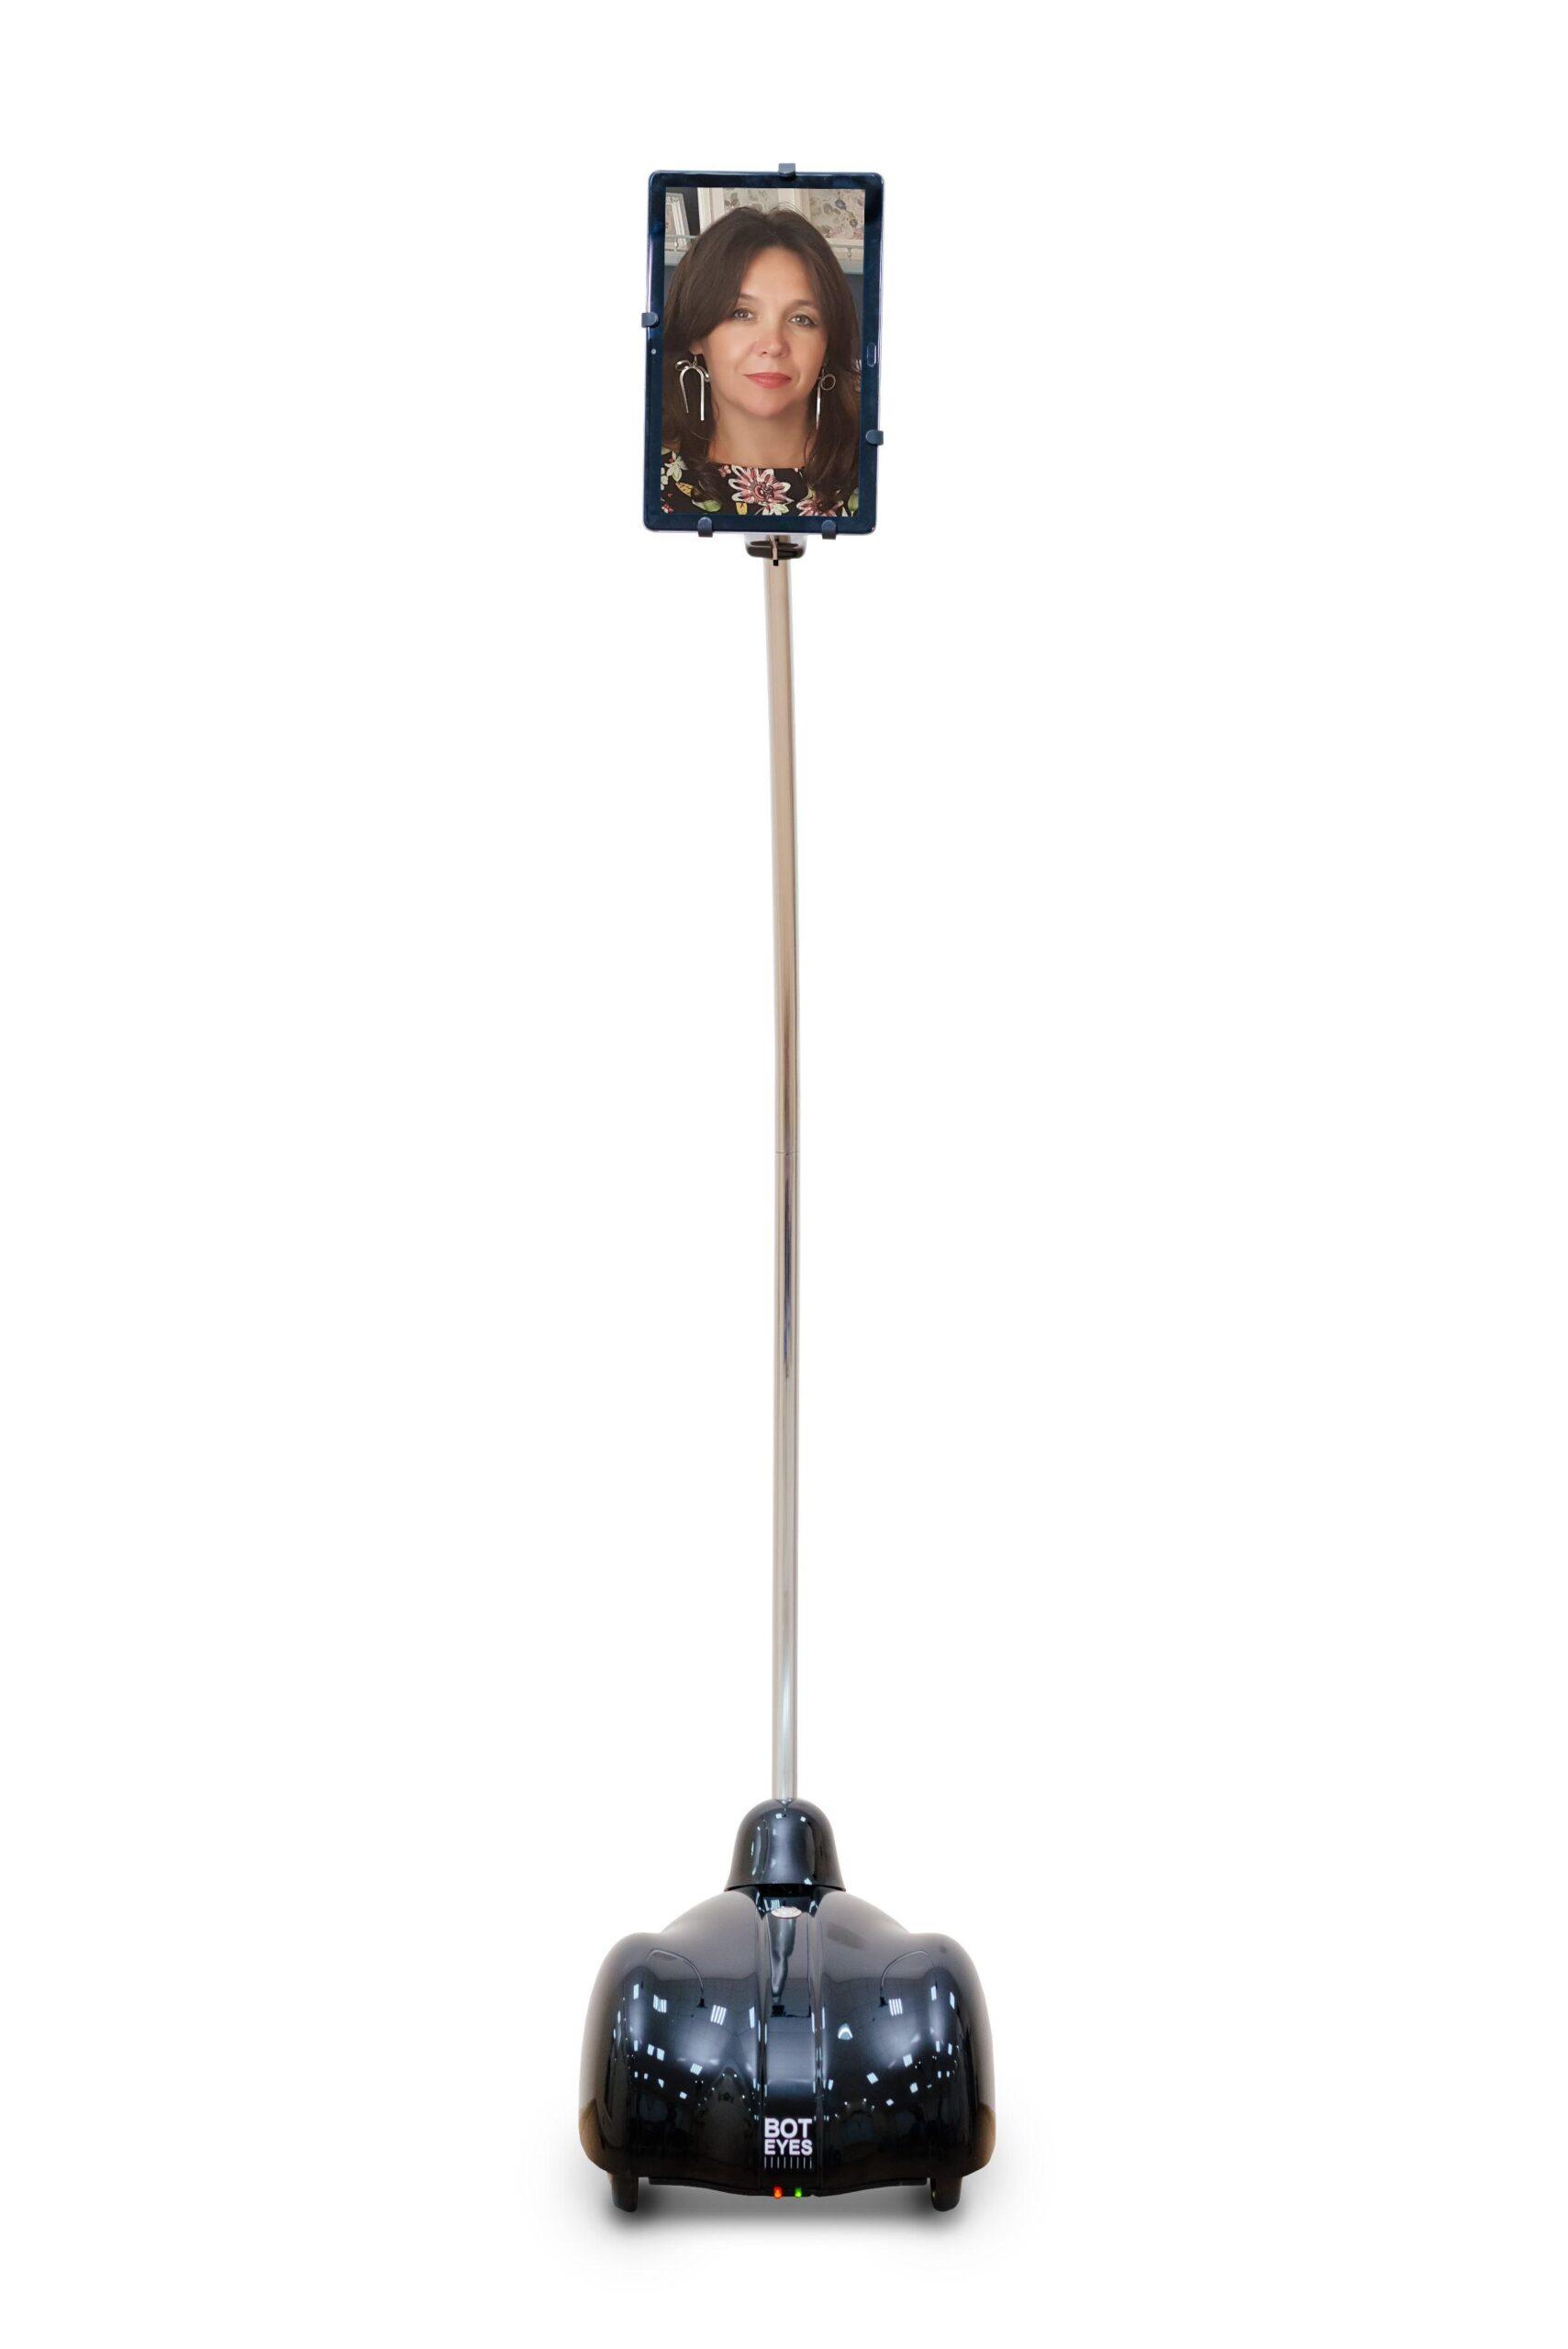 Робот телеприсутствия BotEyes